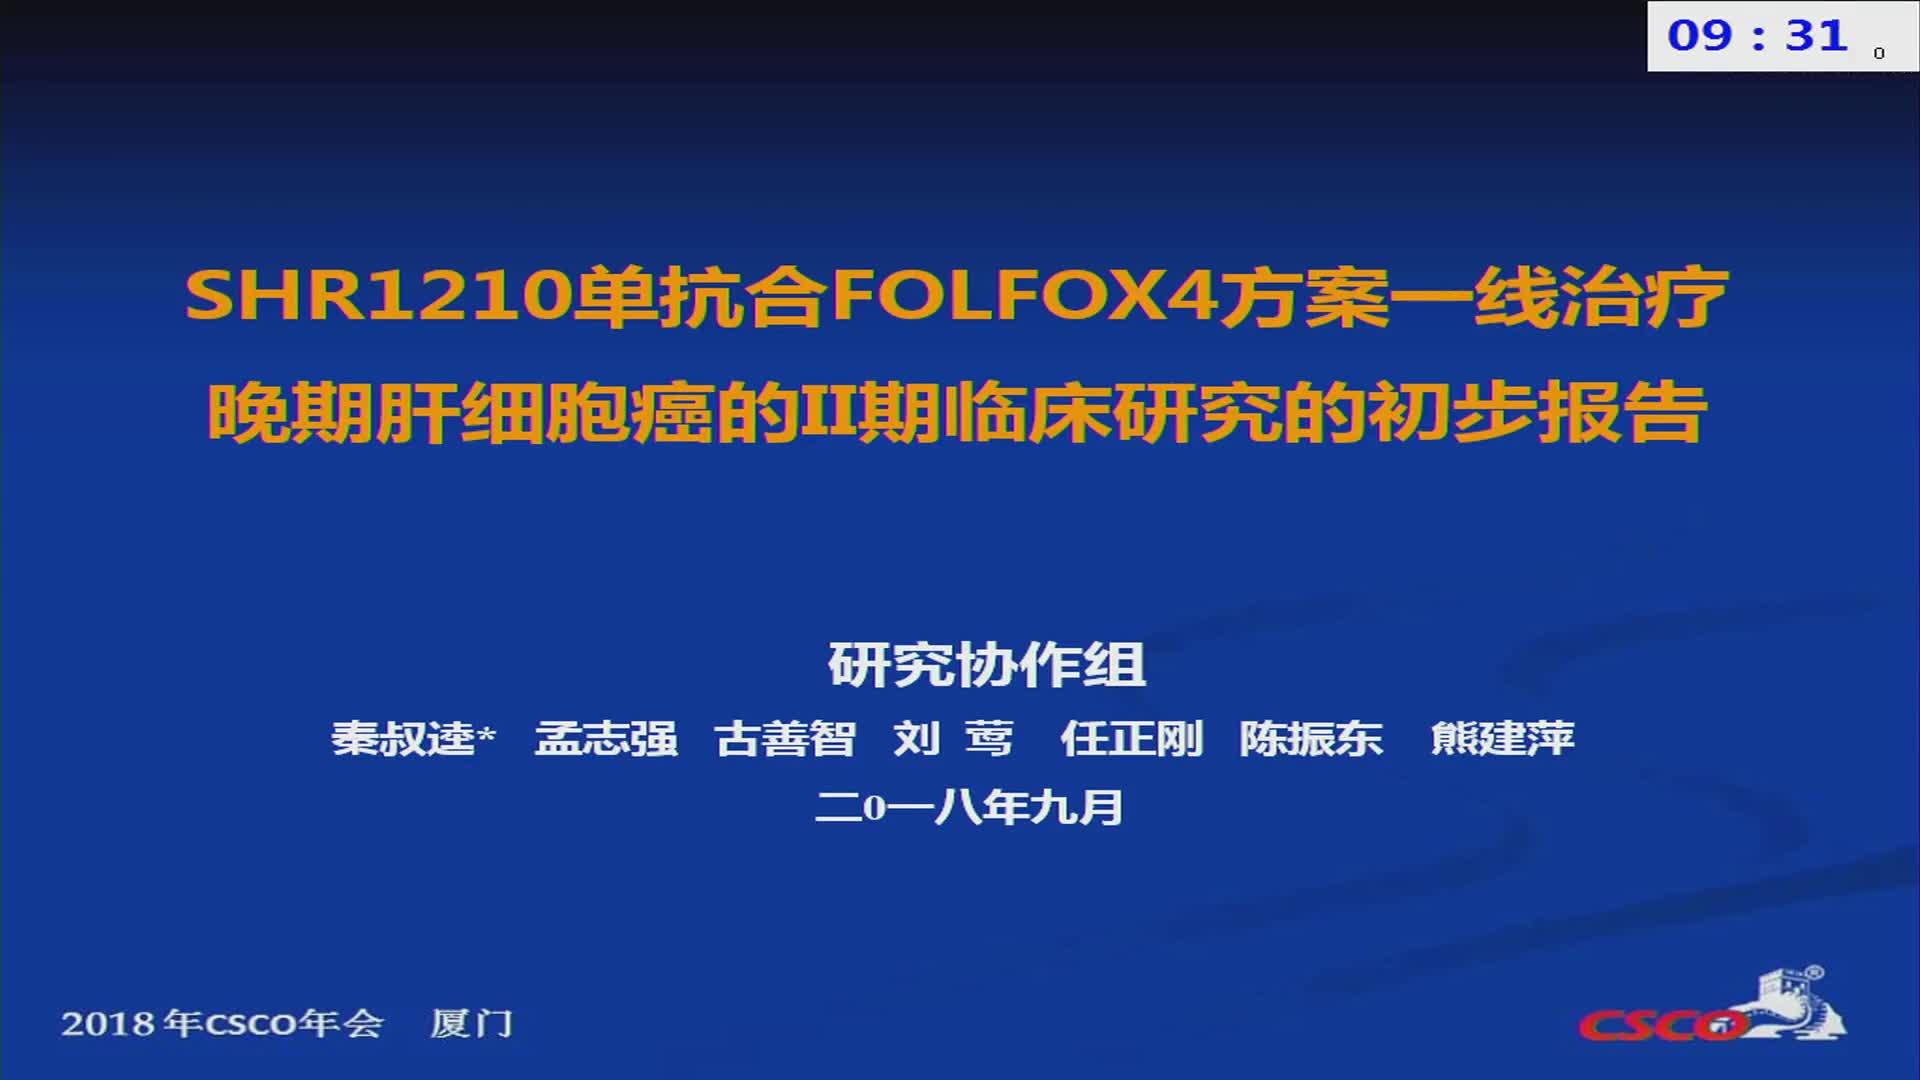 SHR-1210联合FOLFOX4方案在中晚期肝癌中的多中心II期临床研究—初步报告